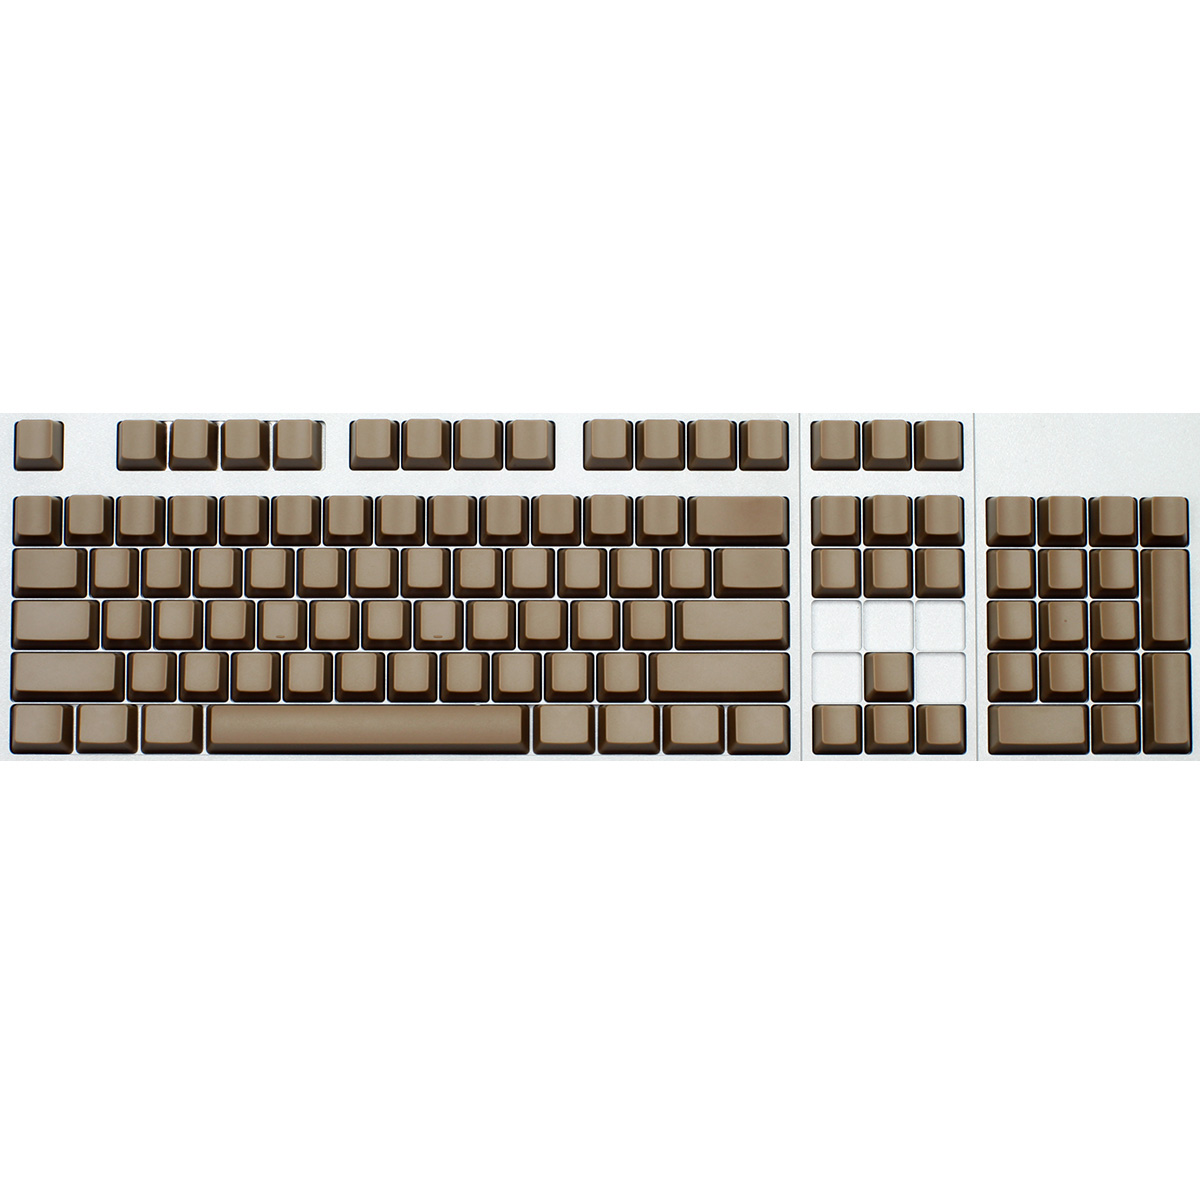 Max ANSI 104-key Cherry MX Replacement Keycap Set (Blank)